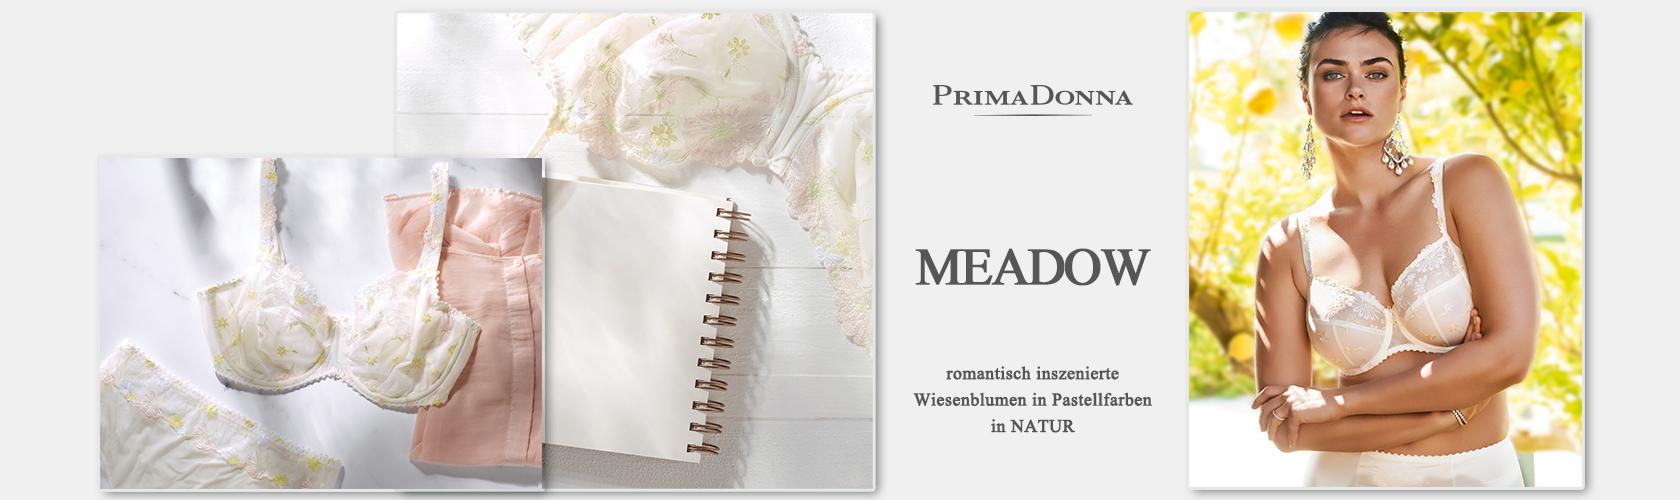 Slideshow MEADOW WDH 10.08.